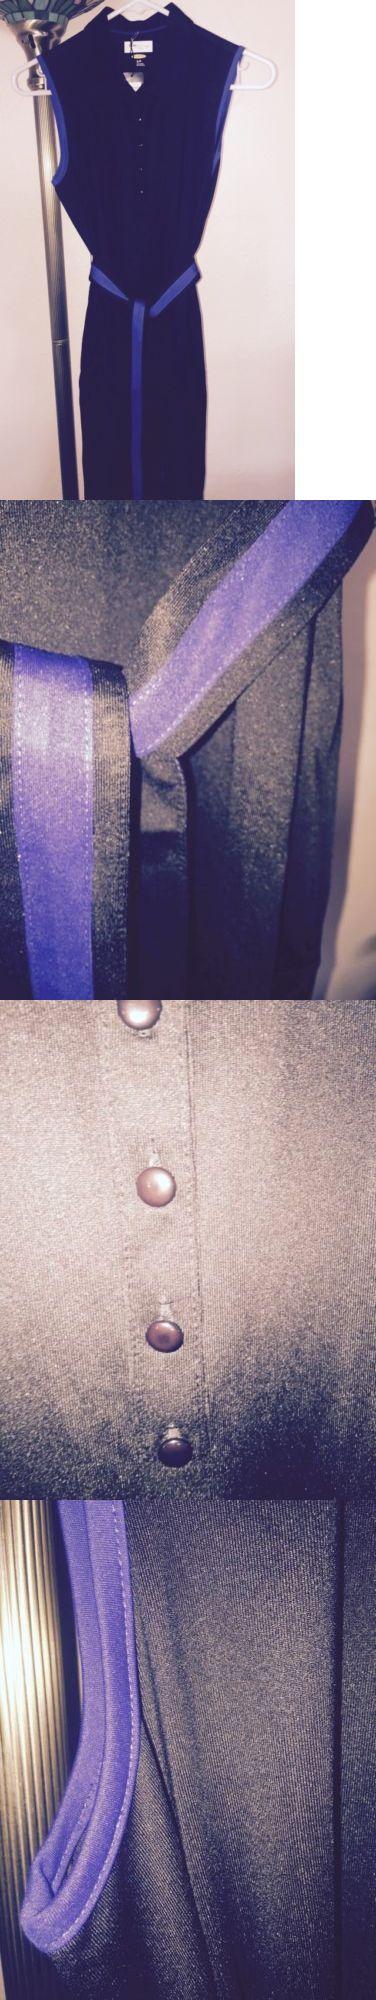 Skirts Skorts and Dresses 179003: Nwt Greg Norman Black Sleeveless Golf Dress W/Blue Trim Sz Small -> BUY IT NOW ONLY: $36.99 on eBay!